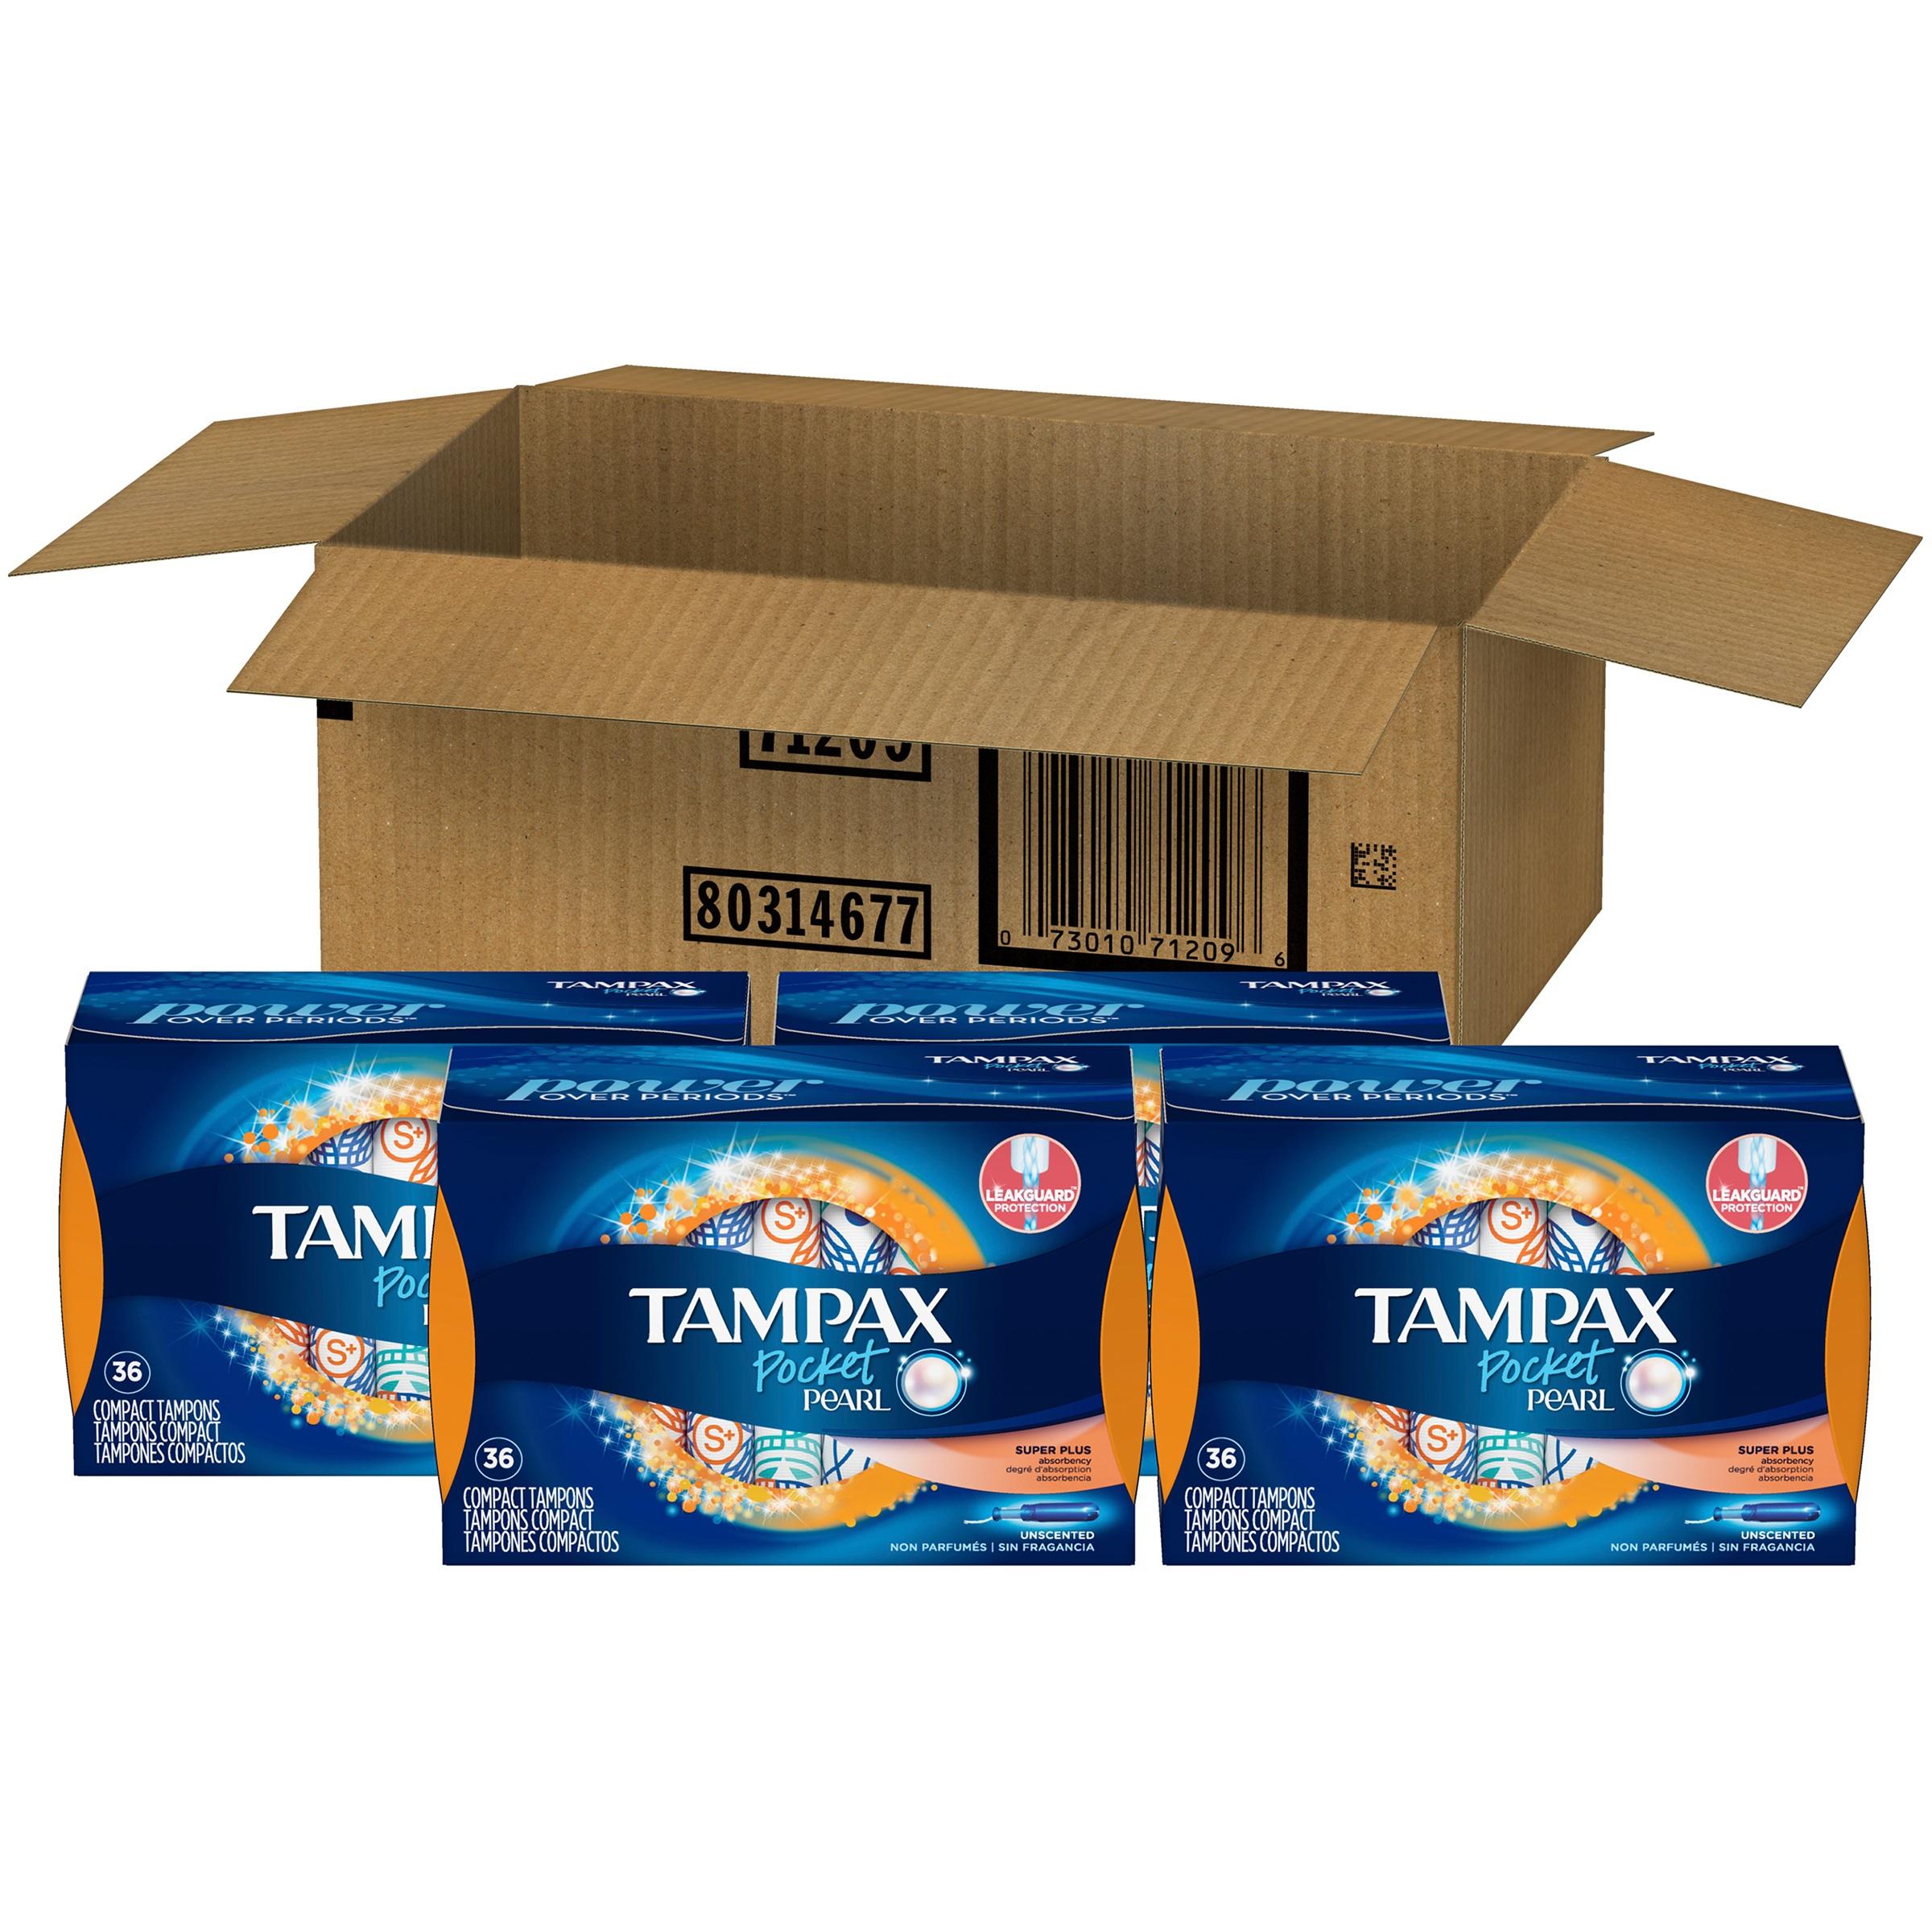 Tampax Pocket Pearl Super Plus Plastic Tampons, Unscented, 144 Ct